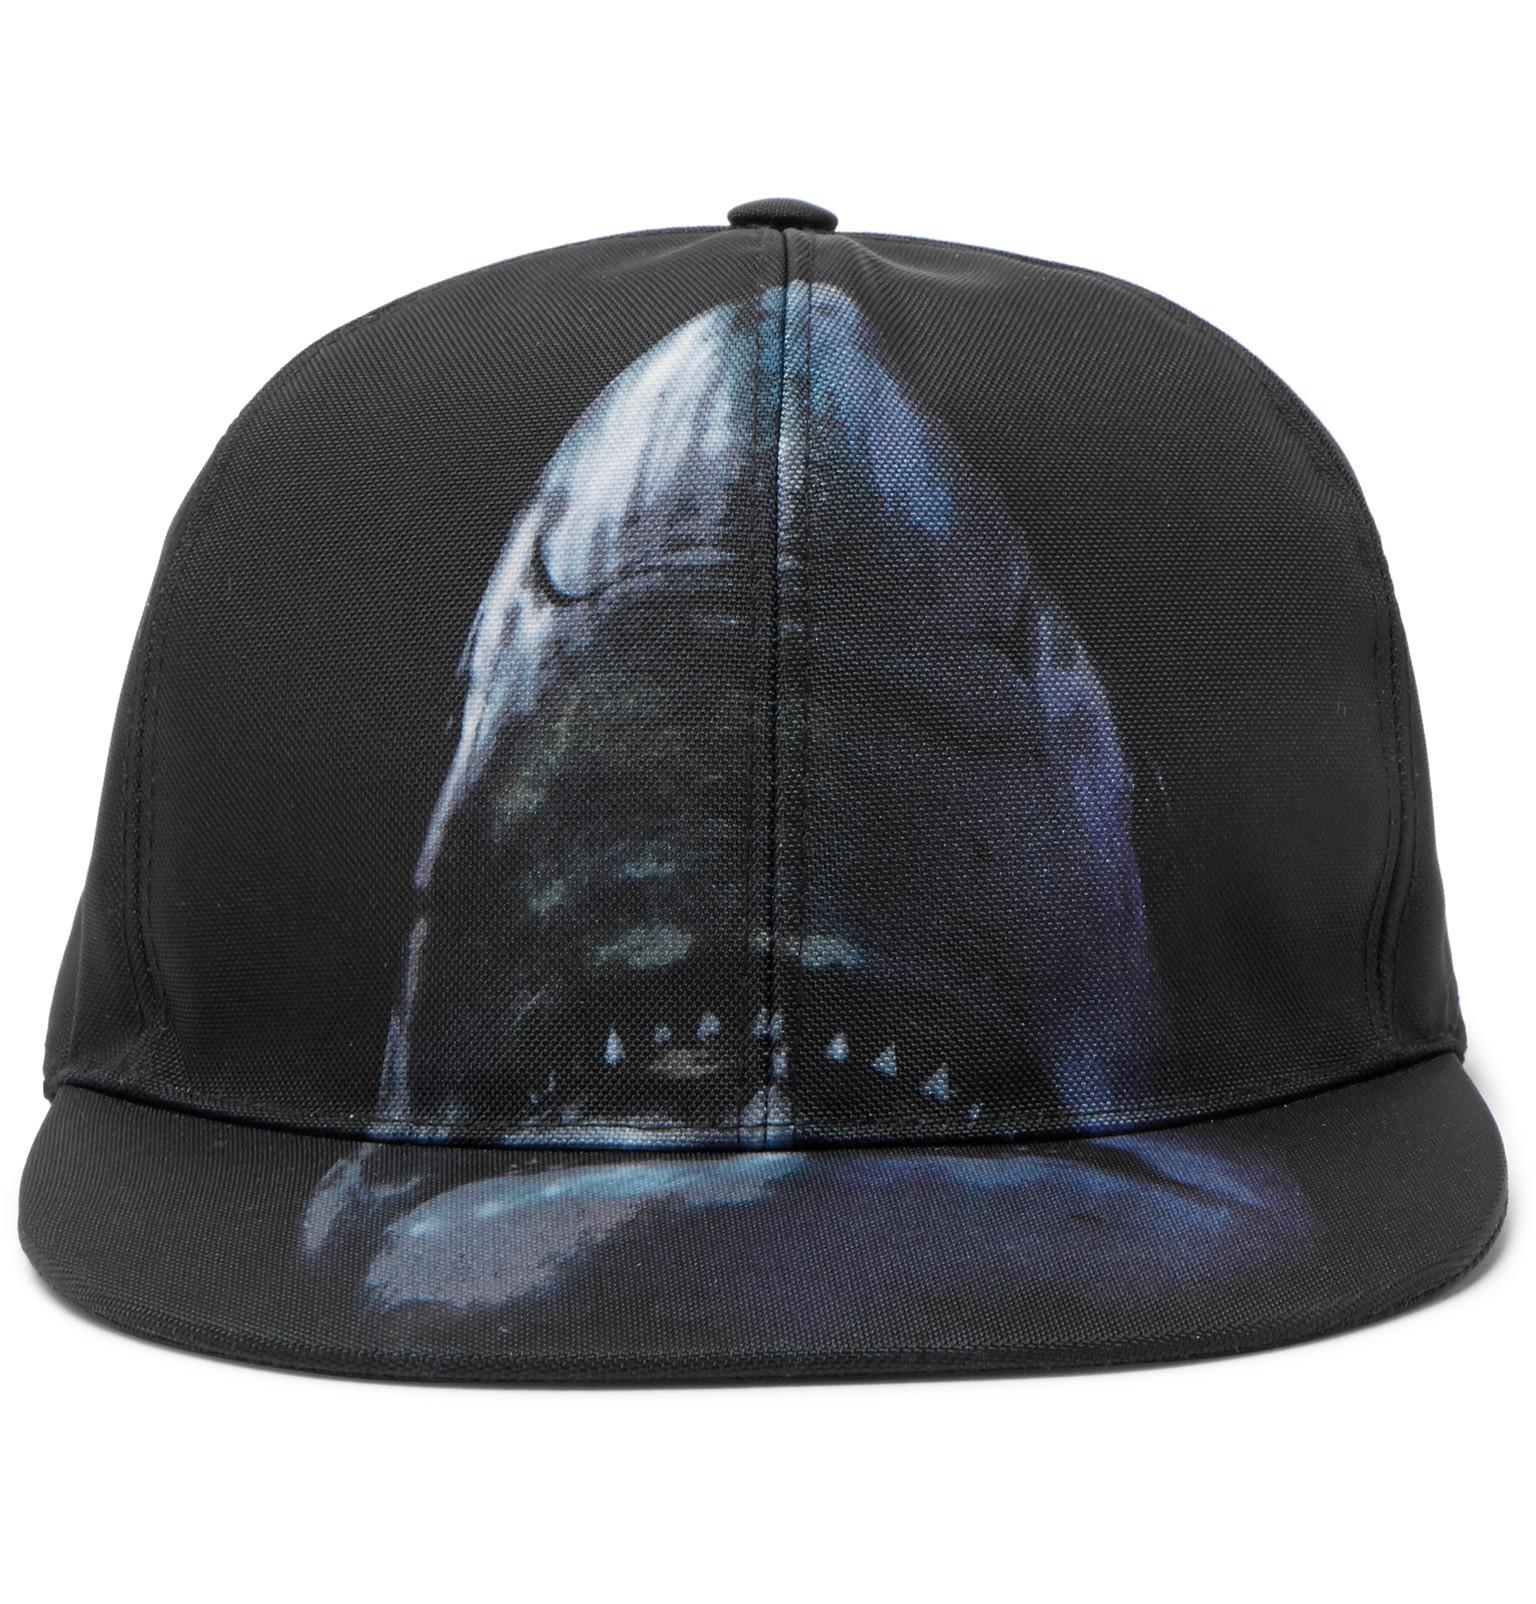 Givenchy Shark-print Canvas Baseball Cap in Black for Men - Lyst 729290050cc